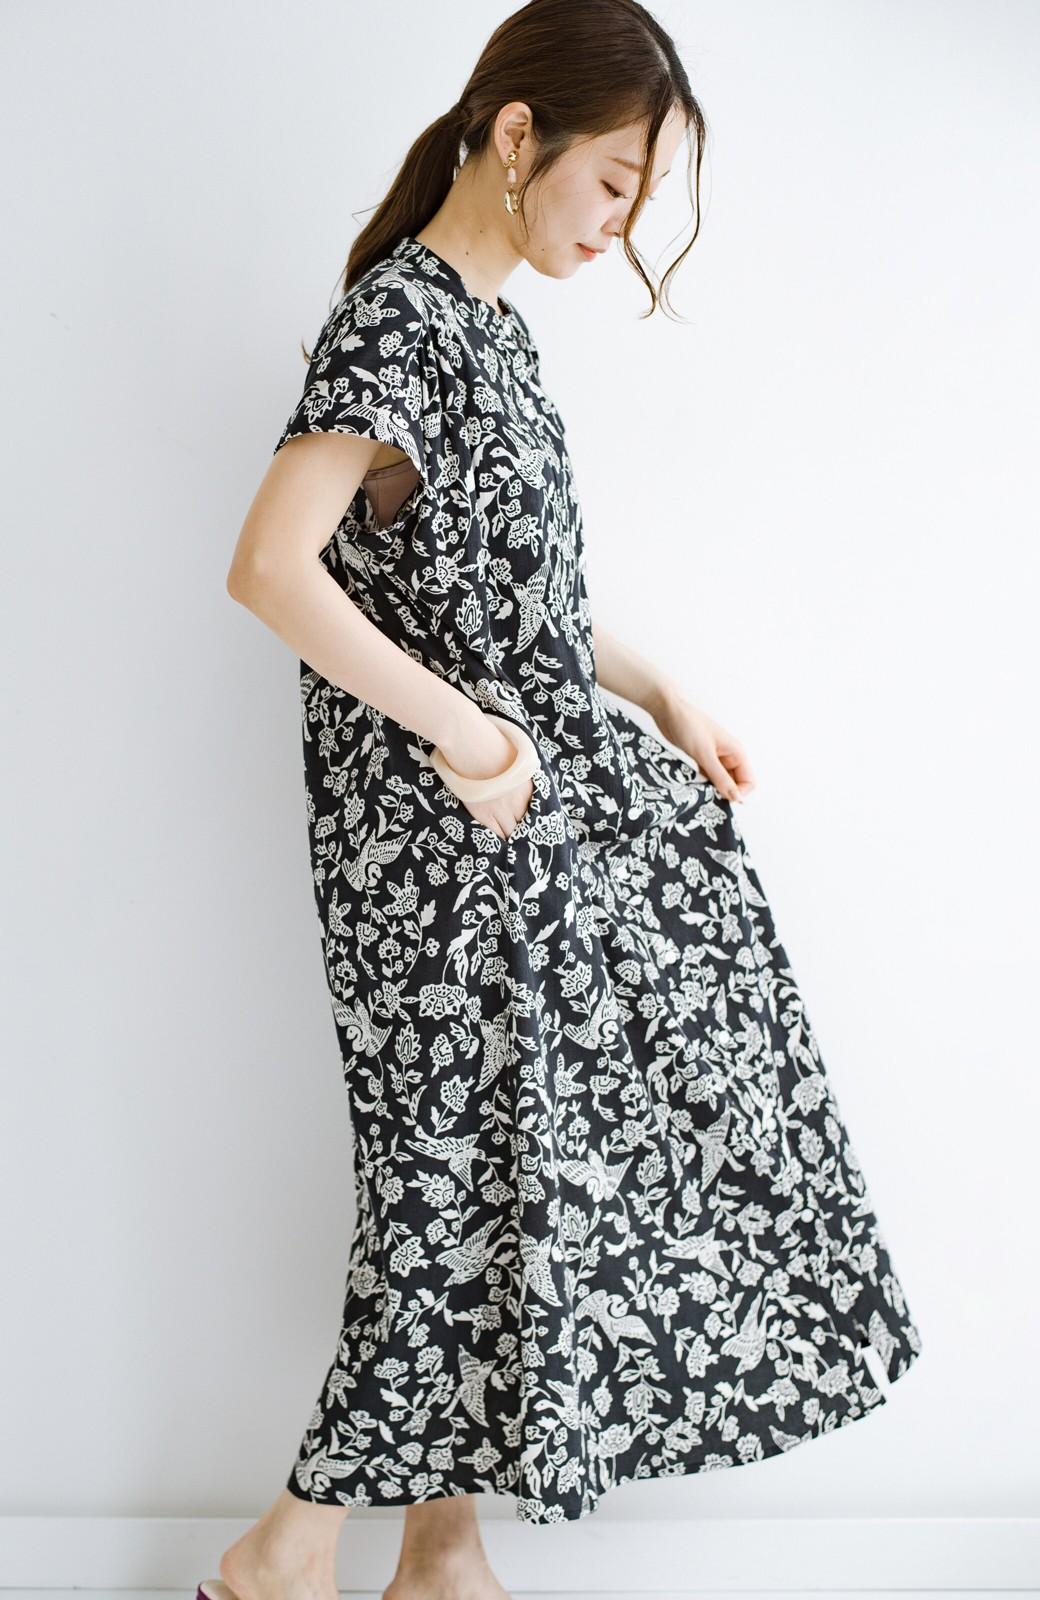 haco! 京都の浴衣屋さんと作った浴衣生地の羽織ってもかわいいロングワンピース <ブラック系その他>の商品写真23